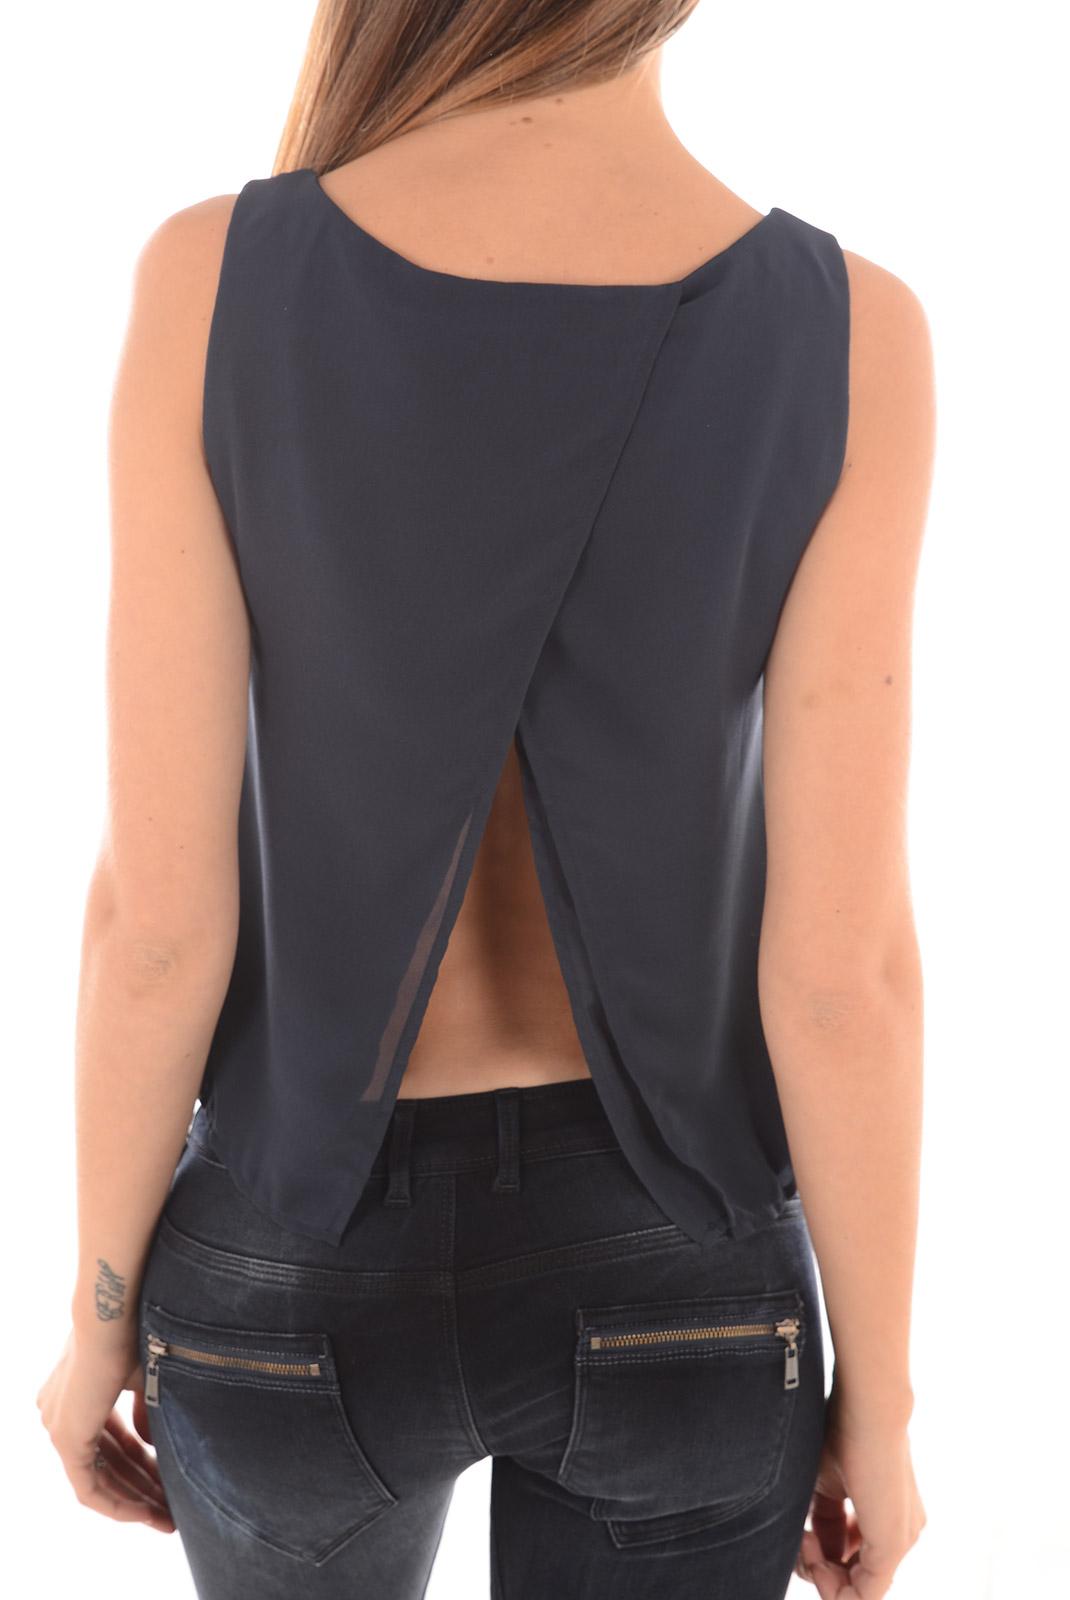 Tops & Tee shirts  Vero moda CLARA SL TOP WP15 TOTAL ECLIPSE